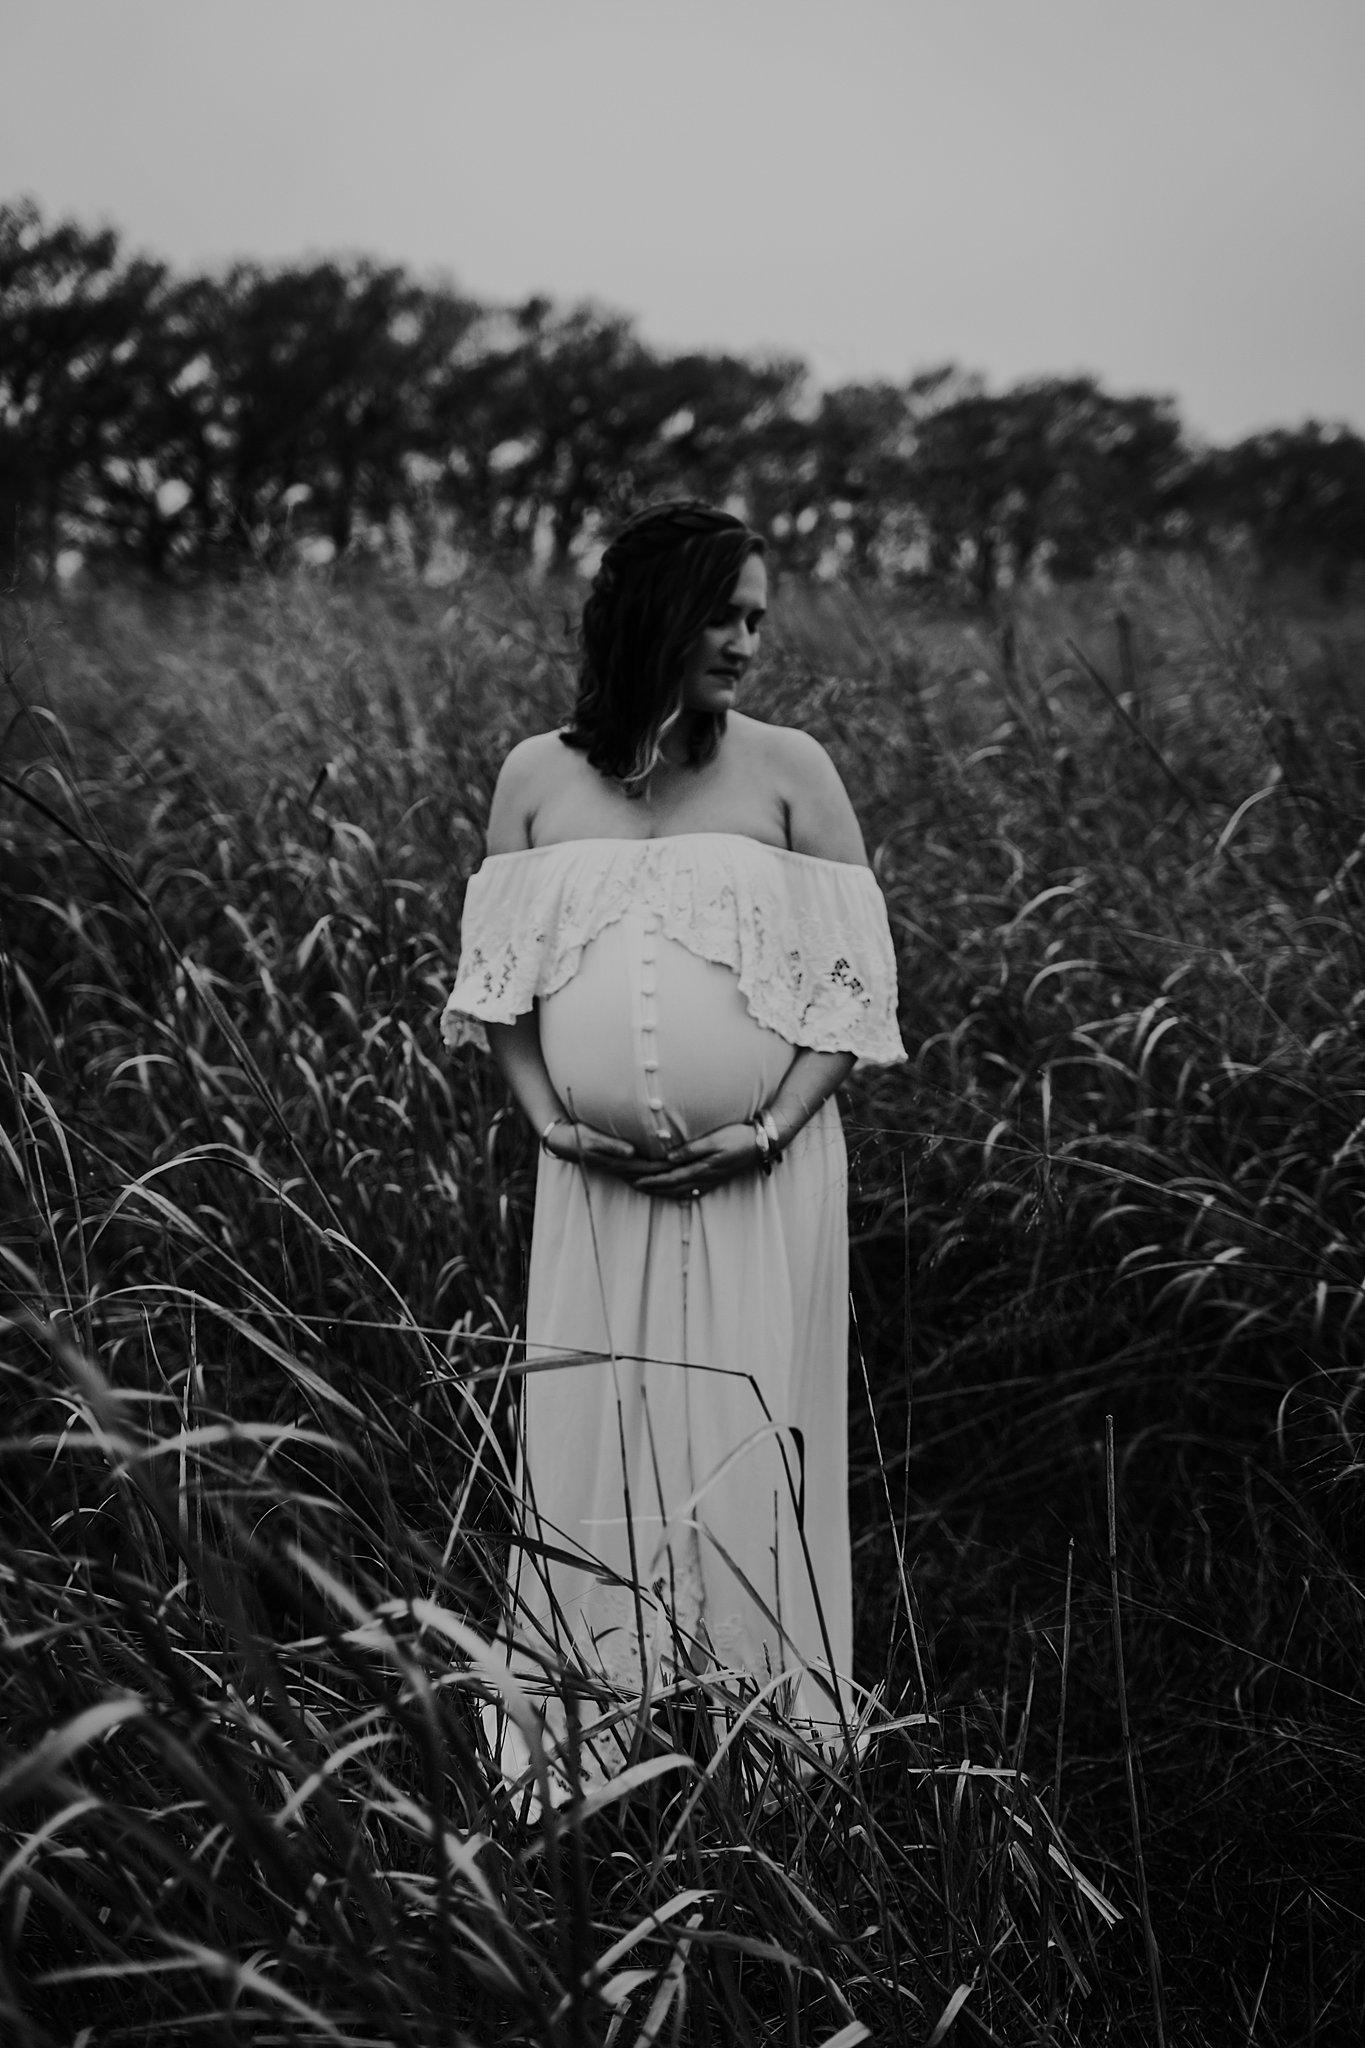 Katie-San-Antonio-Maternity-Photographer-50_WEB.jpg